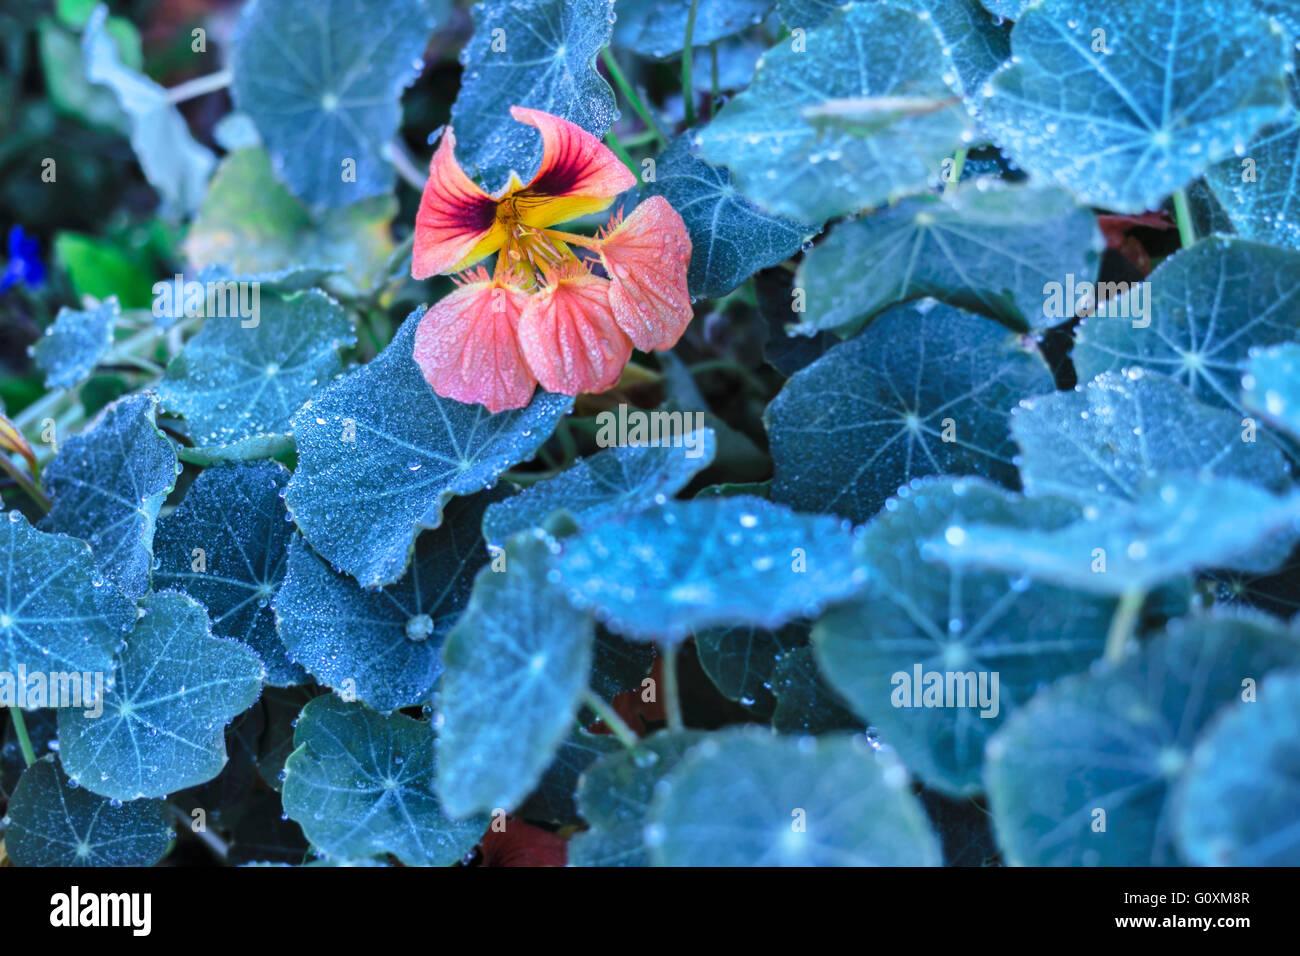 Nice flower of nasturtium at dark leaves area - Stock Image